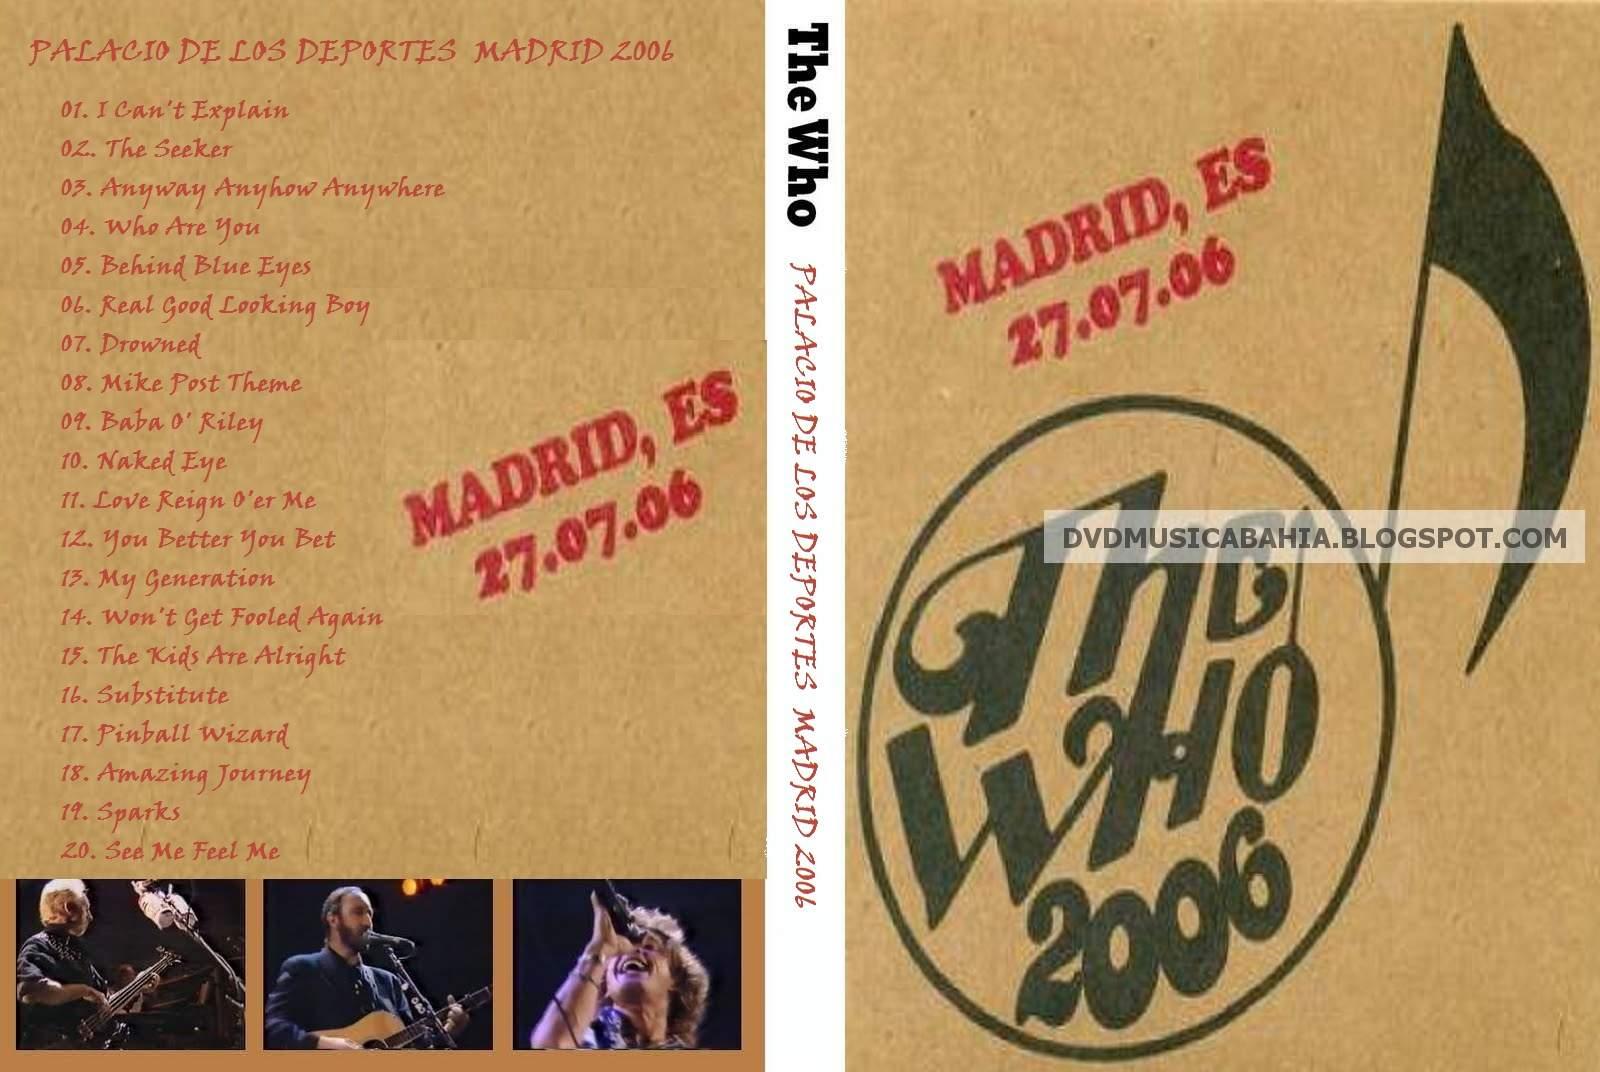 http://4.bp.blogspot.com/-IaWmfO6OmOo/TkrireWSXfI/AAAAAAAABt0/1nm9J8jtU-4/s1600/The+Who+1989-08-16+Tacoma+-+Artwork.jpg